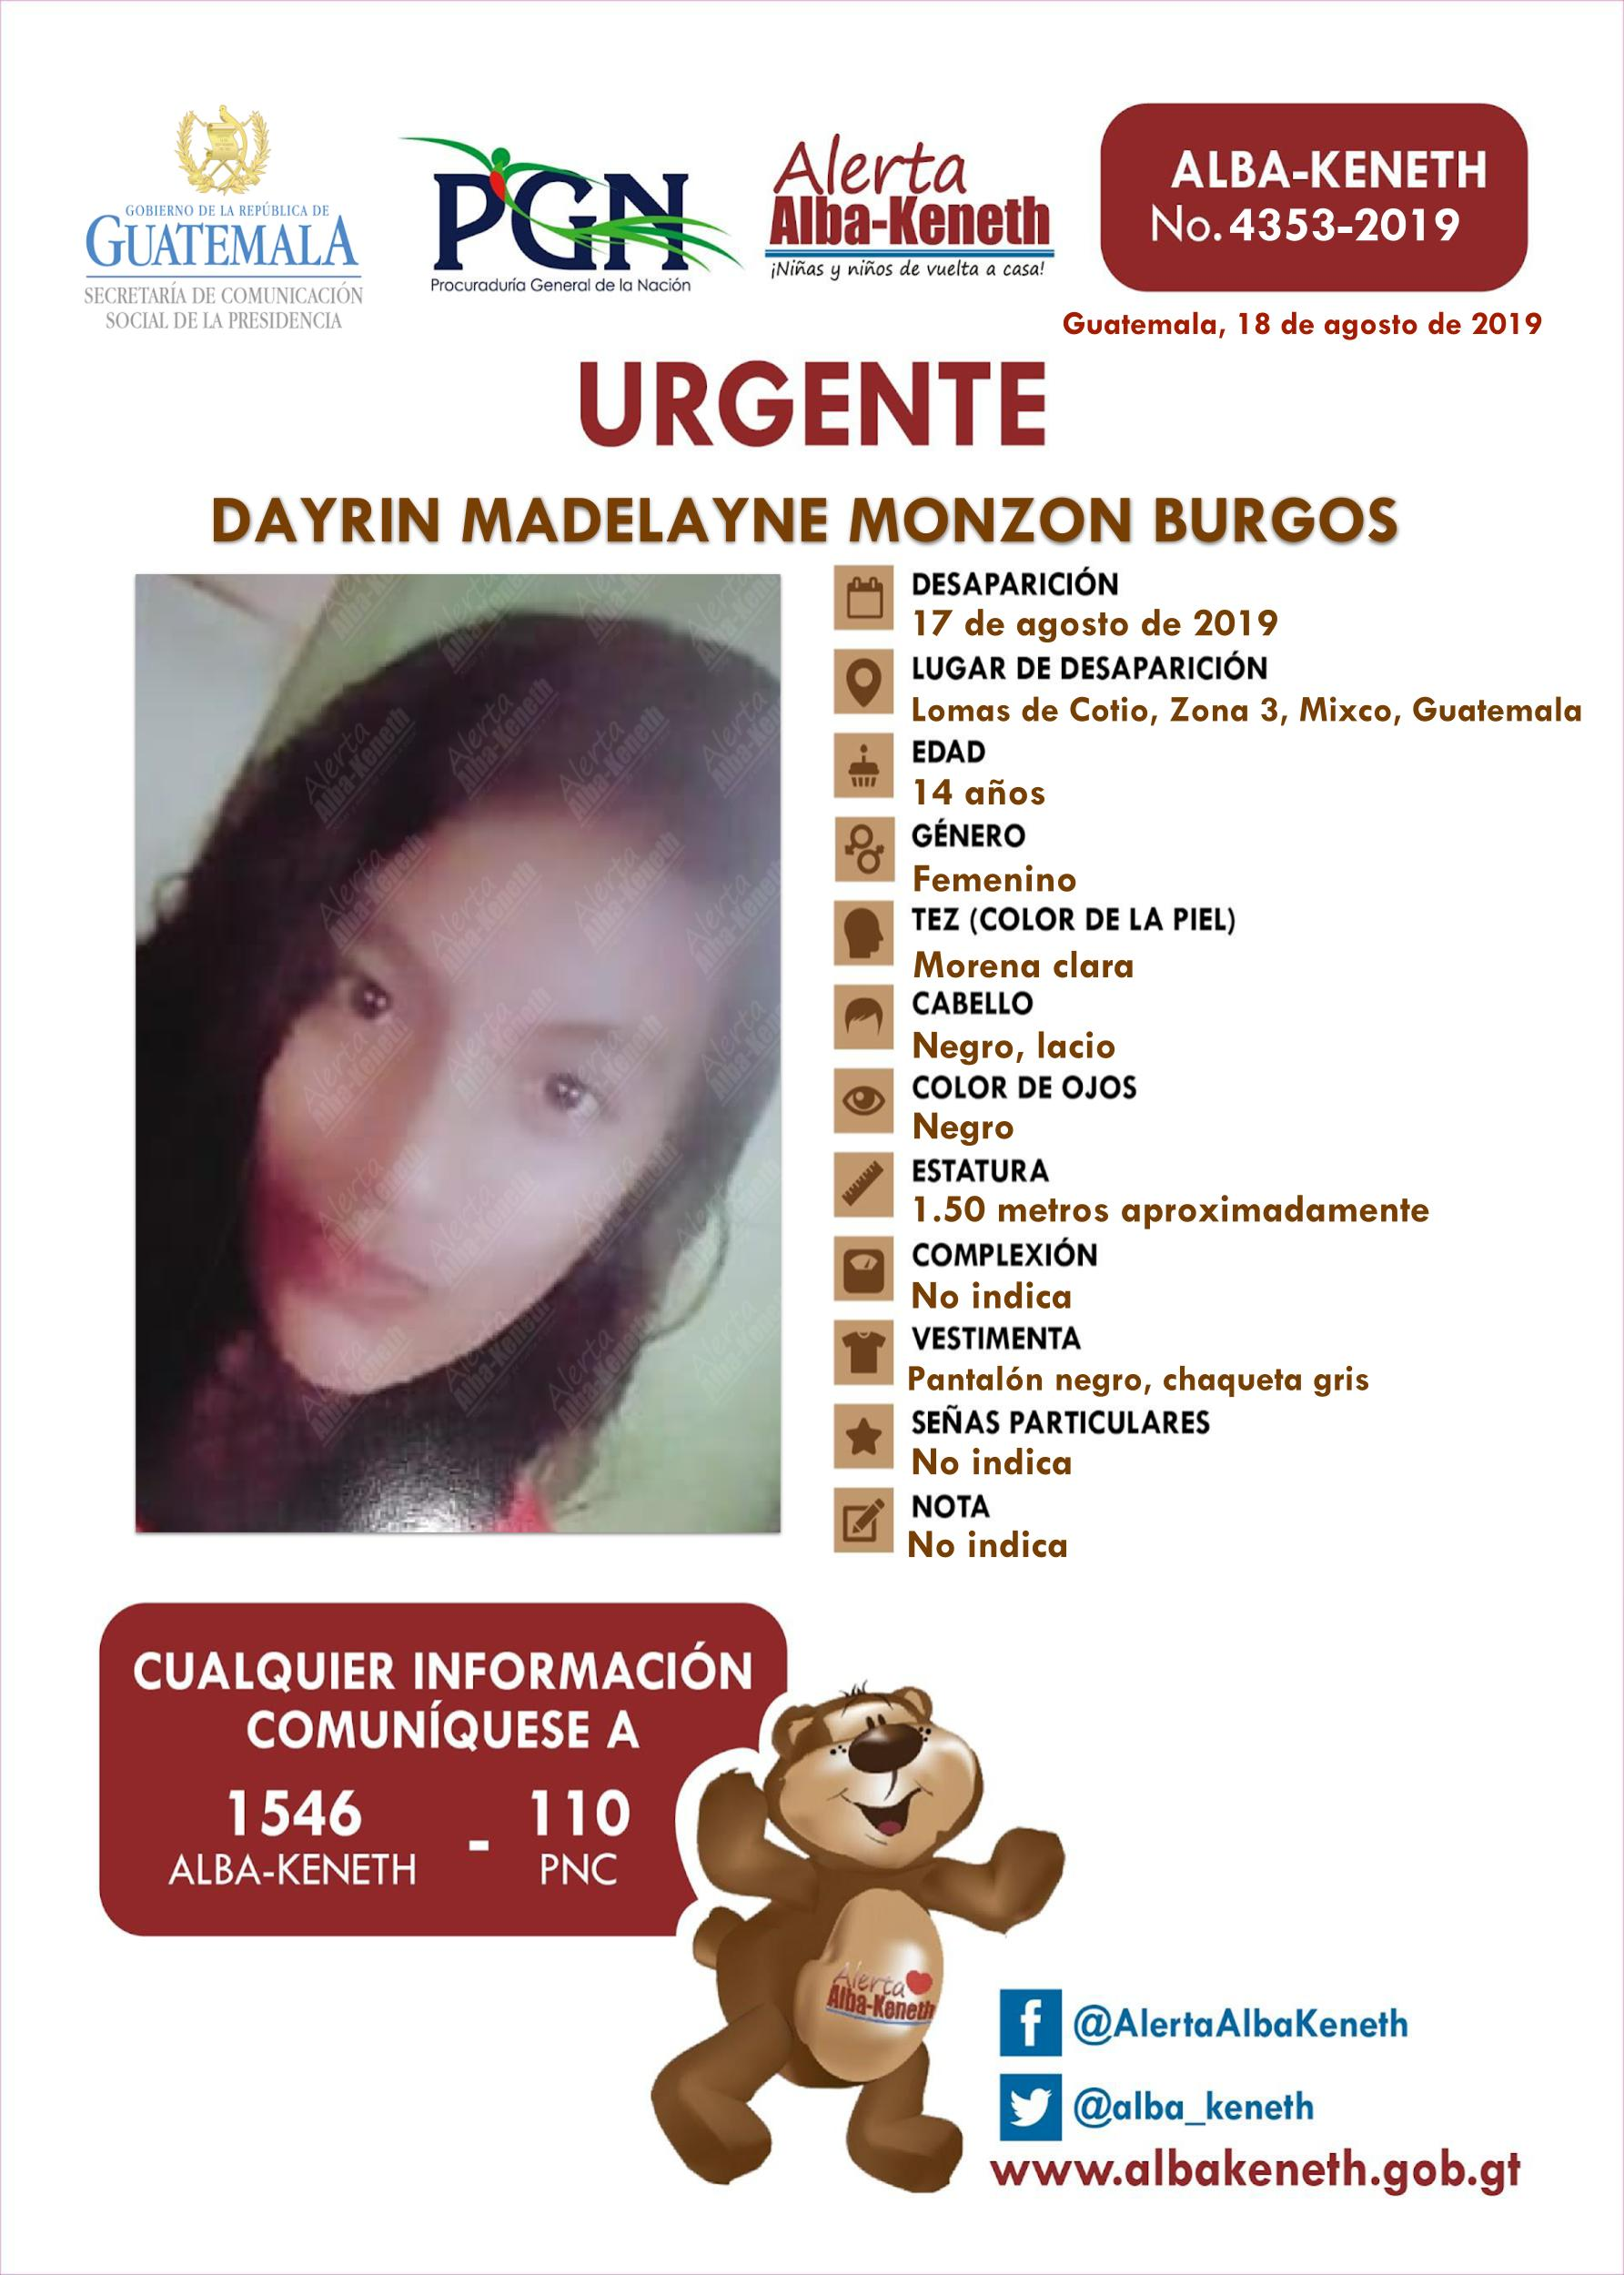 Dayrin Madelayne Monzon Burgos